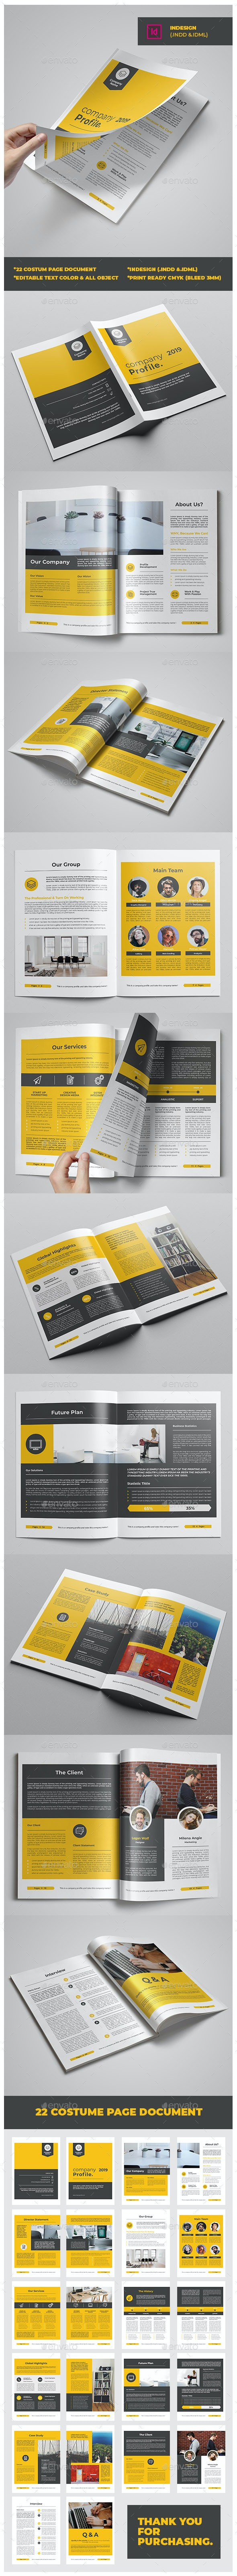 Company Profile Vol.5 - Corporate Brochures